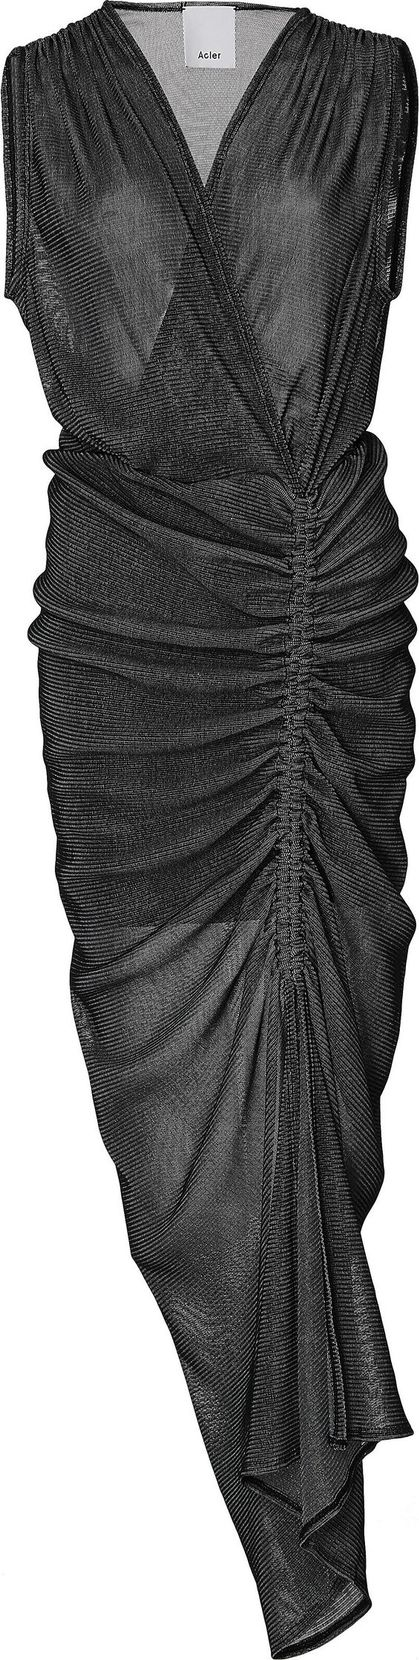 Acler Barlett Gathered Knit Dress